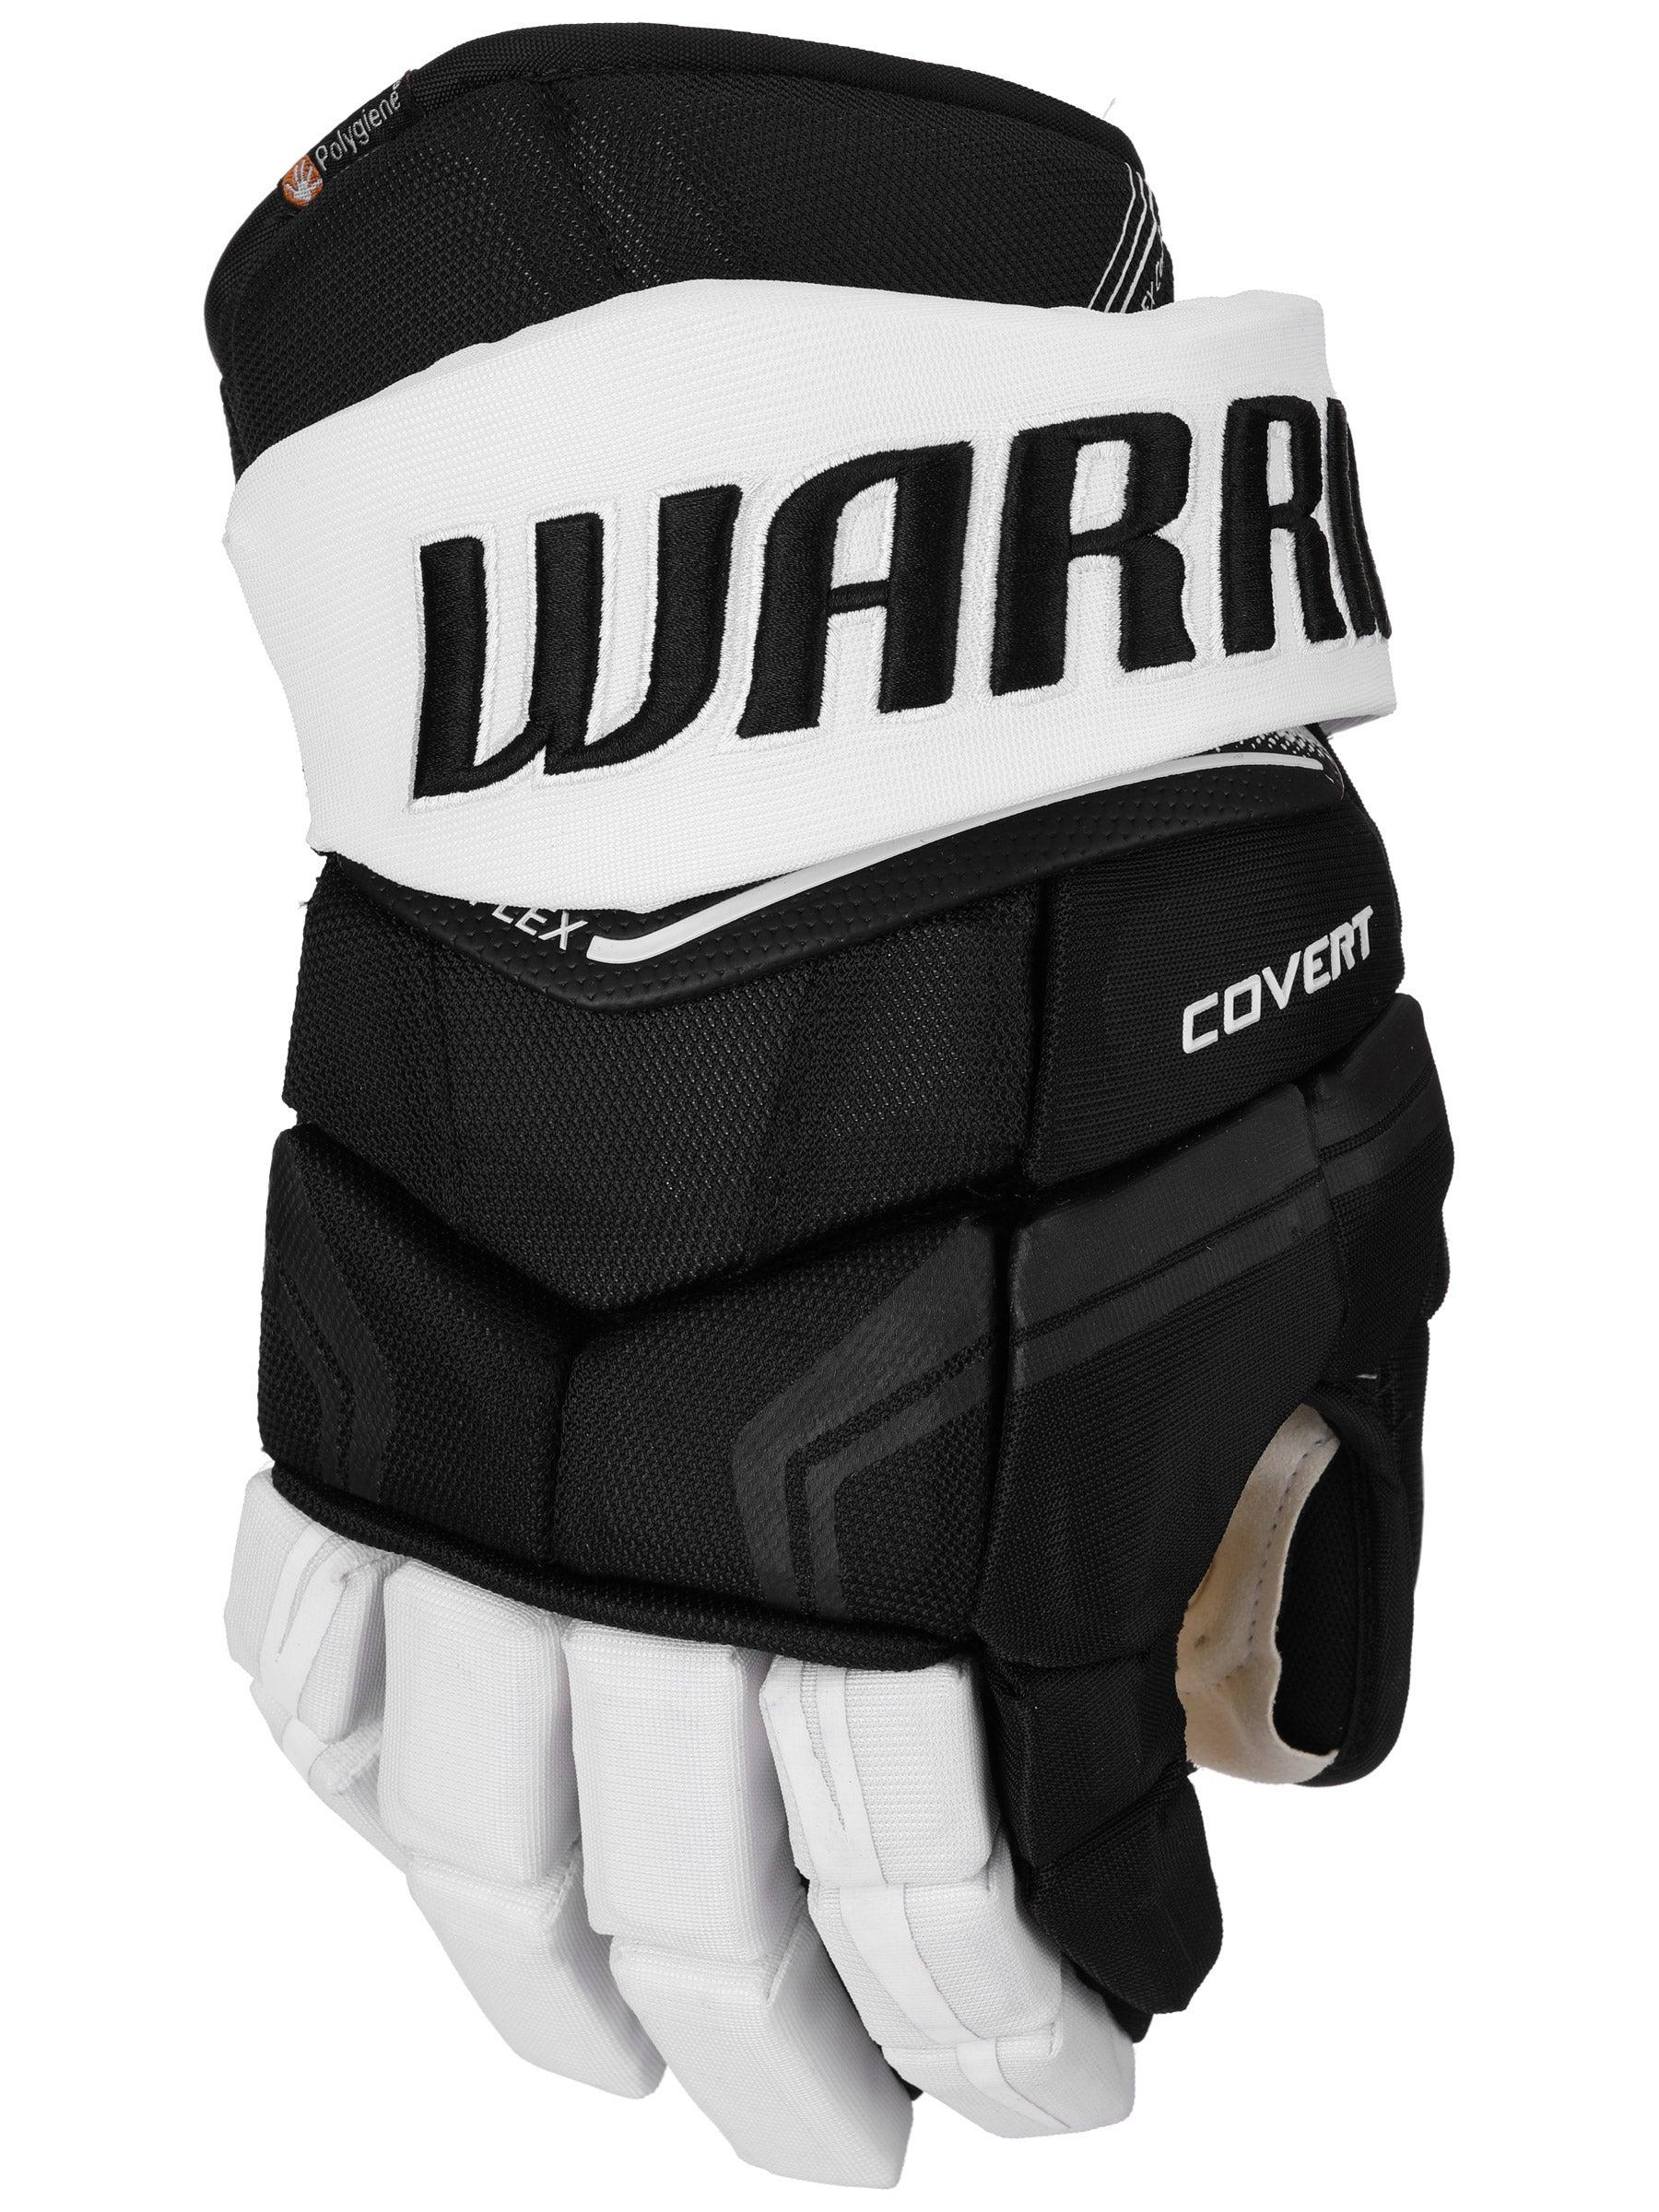 8ac24082acb Warrior QRL5 Gloves Size 14 Black  Red  White Warrior Hockey QRL5G146  Christmas presents